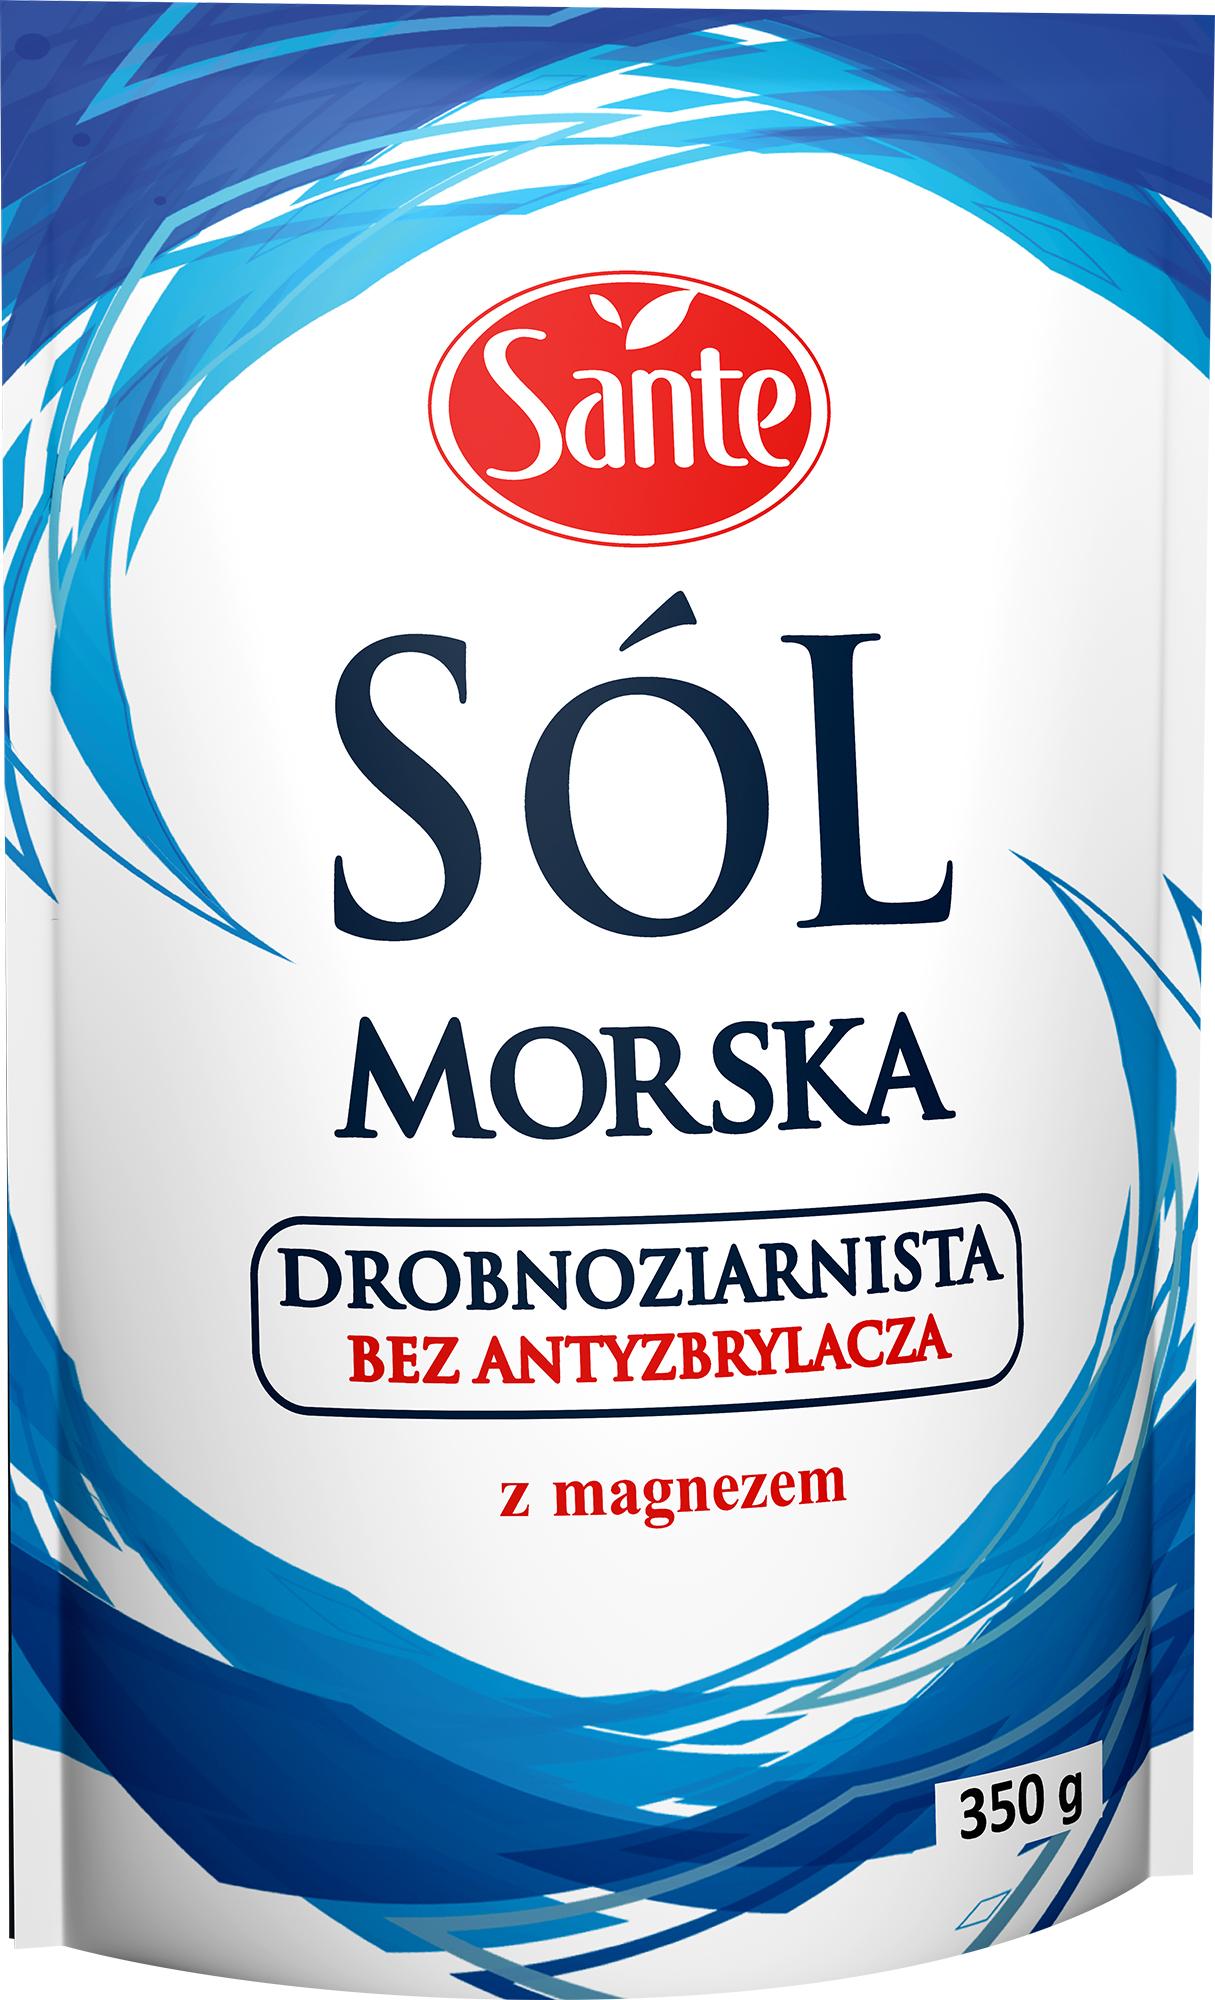 Sól morska jodowana drobnoziarnista 350g